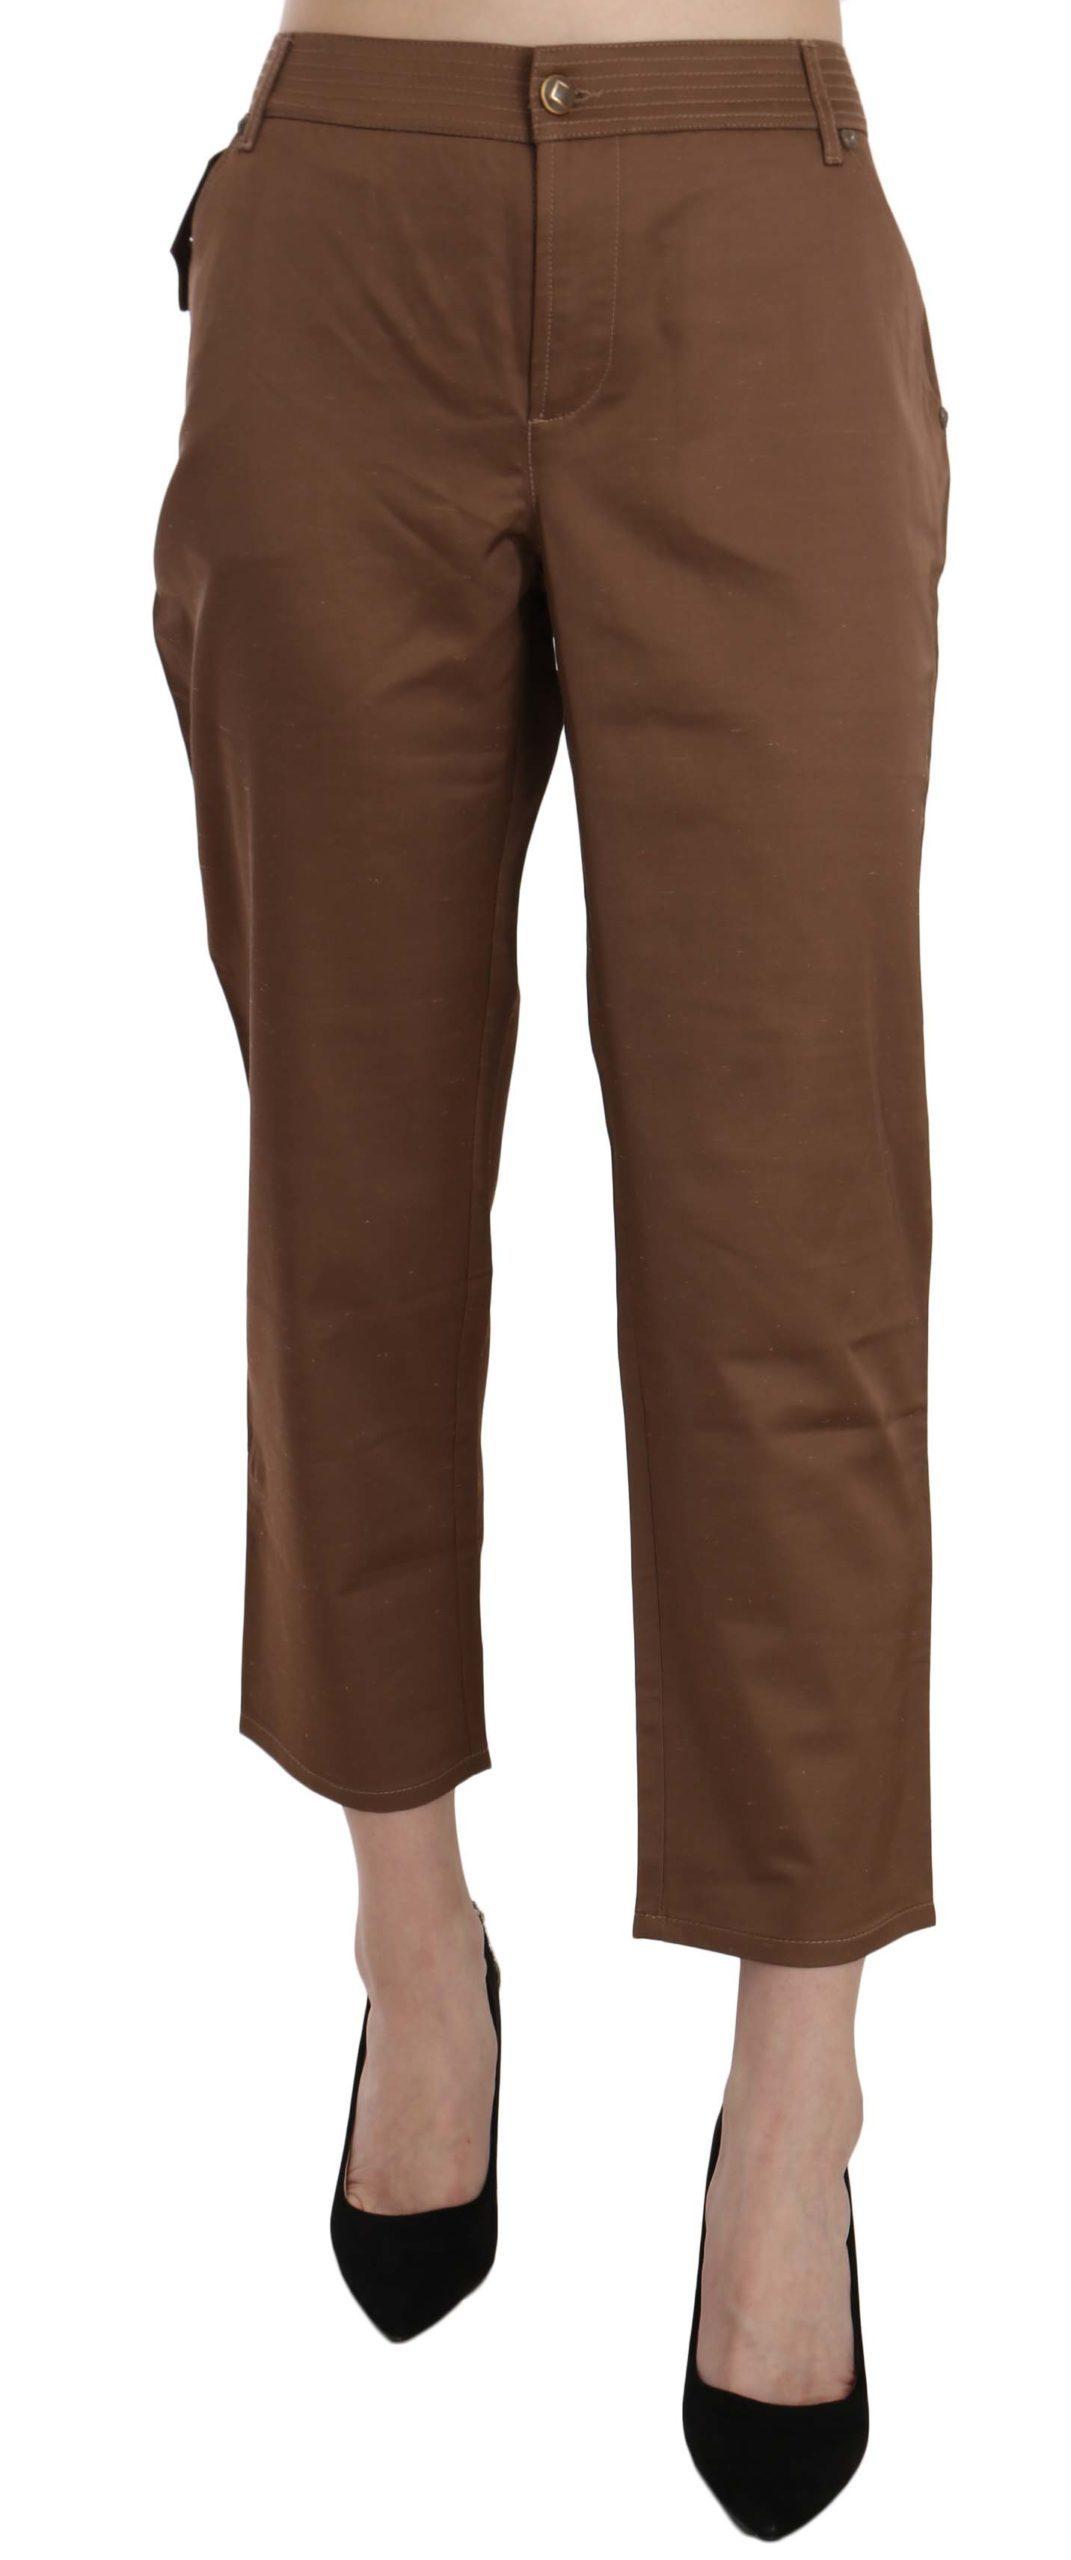 Roberto Cavalli Women's Viscose High Waist Crop Trouser Brown PAN70374 - W26